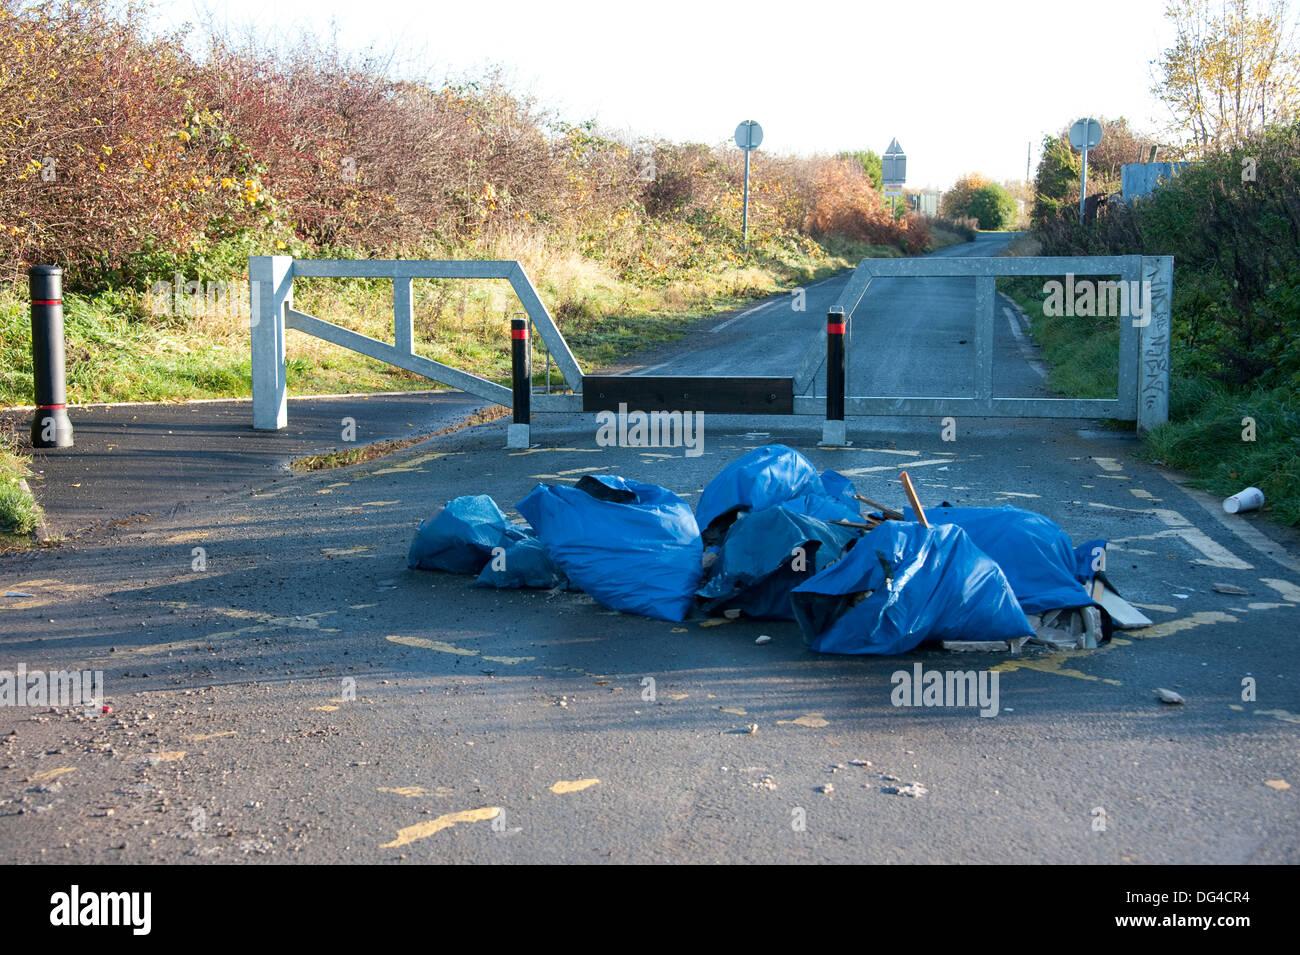 Hazardous waste Asbestos fly tipping illegal - Stock Image